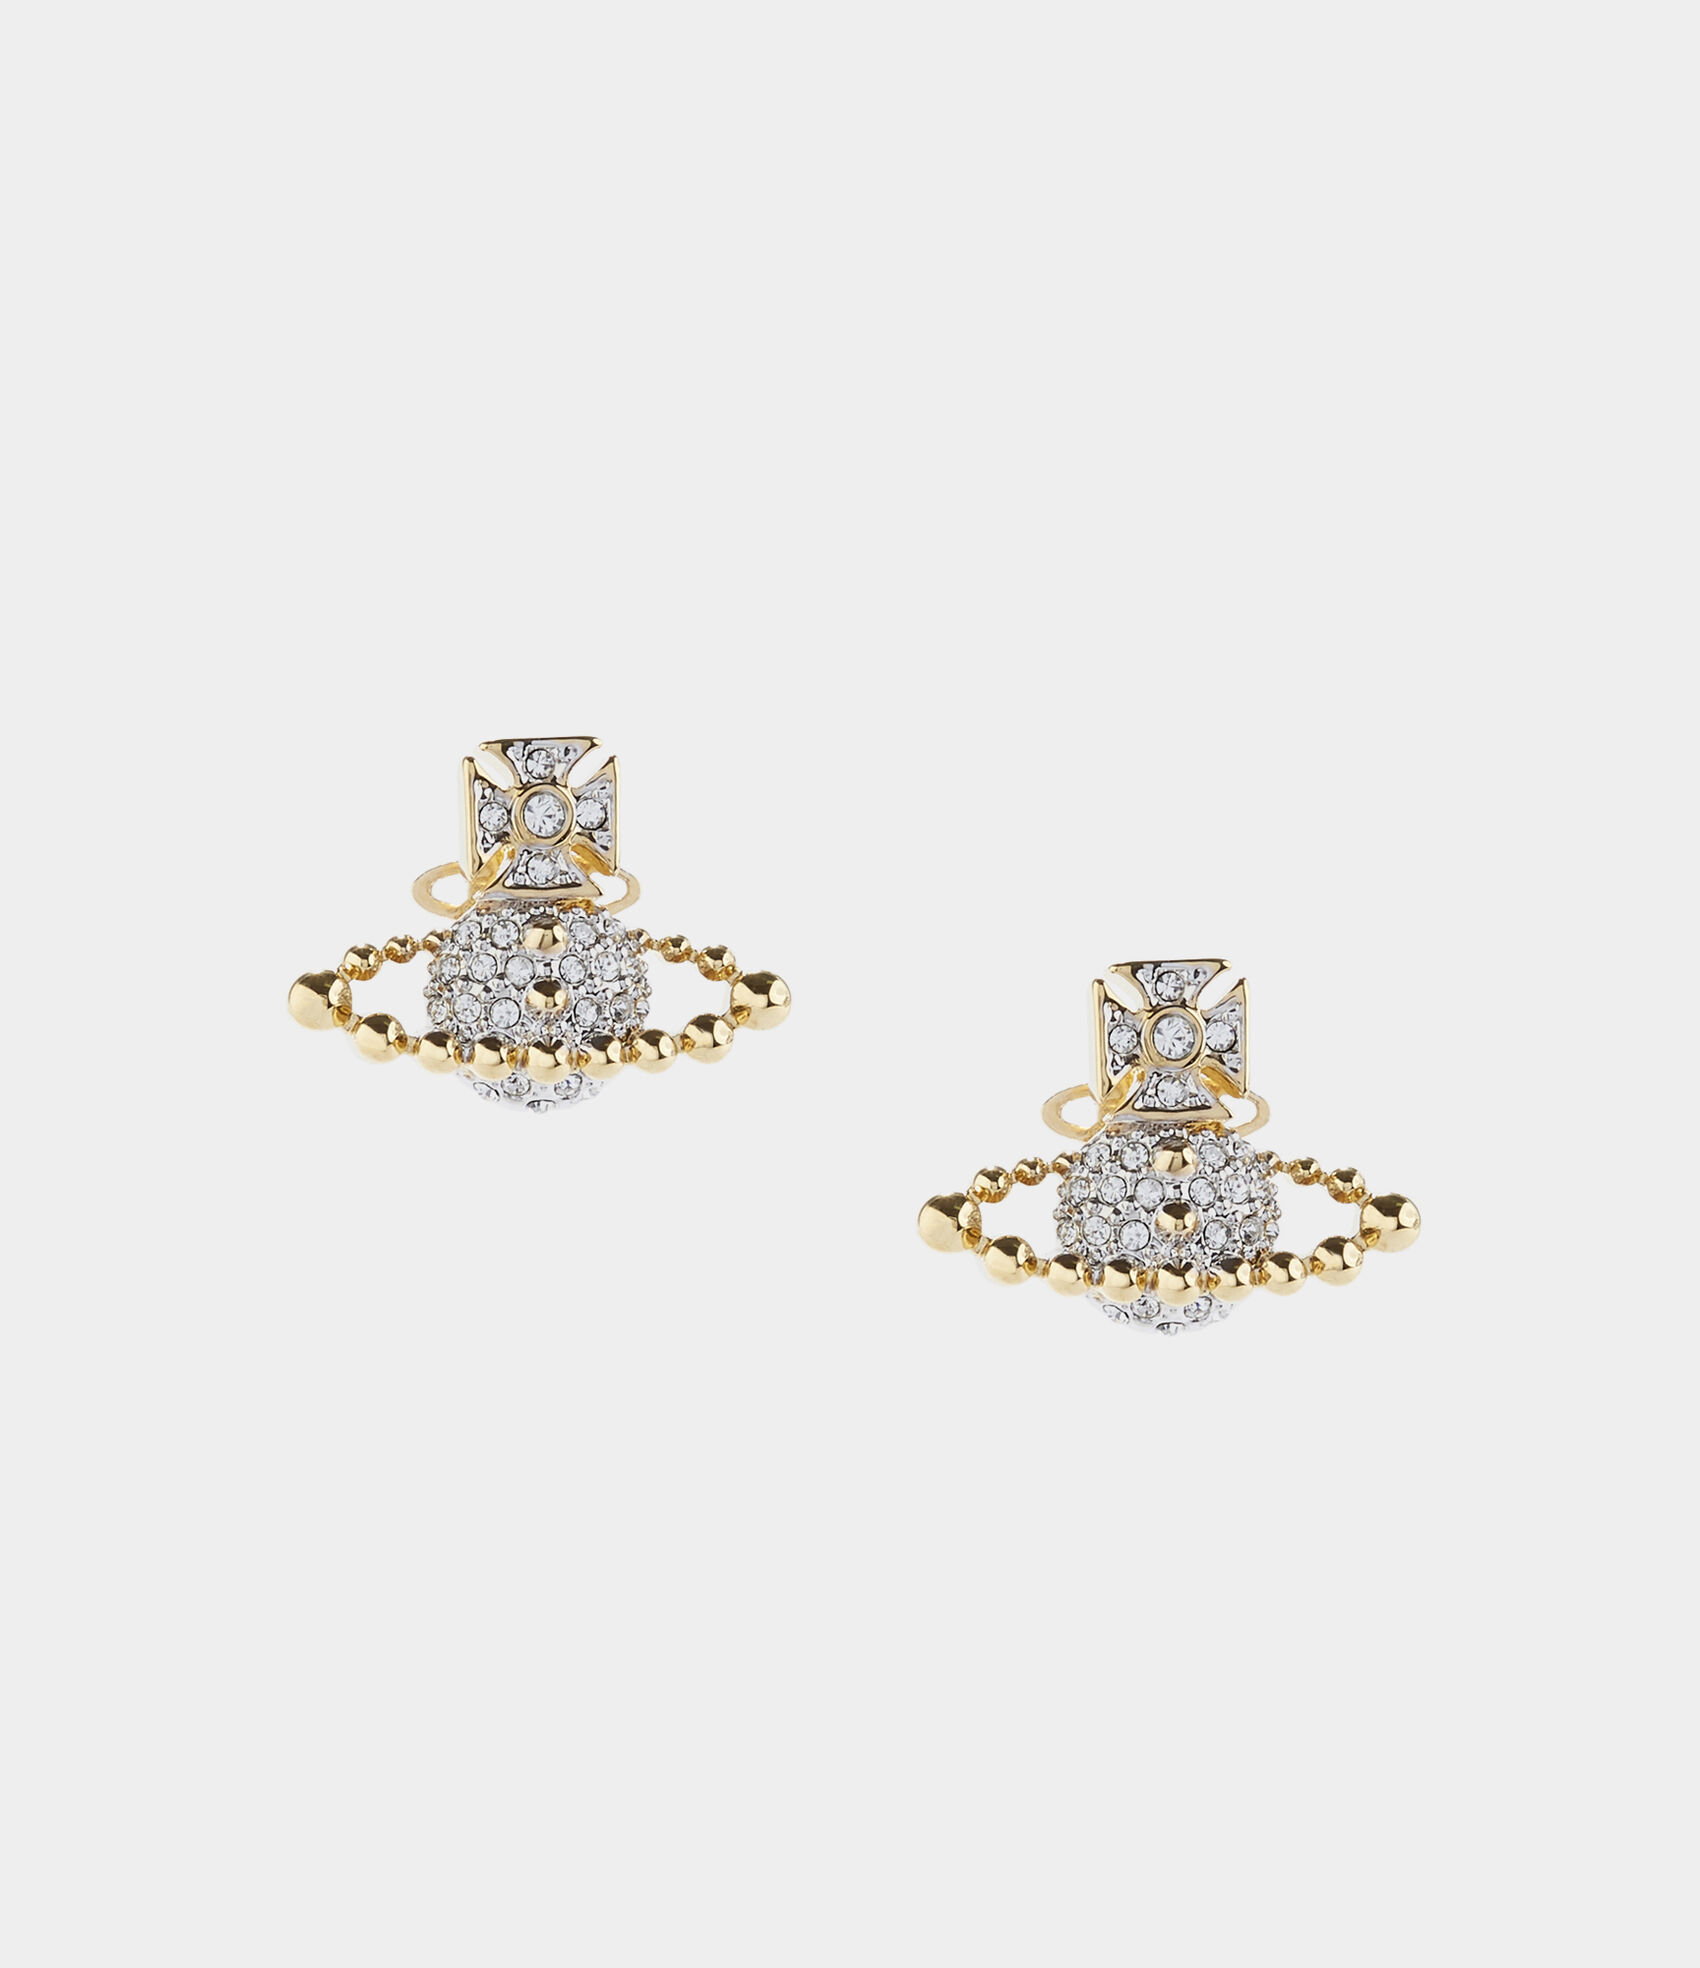 110e2f2516f267 Lena Bas Relief Earrings Gold/Silver Tone